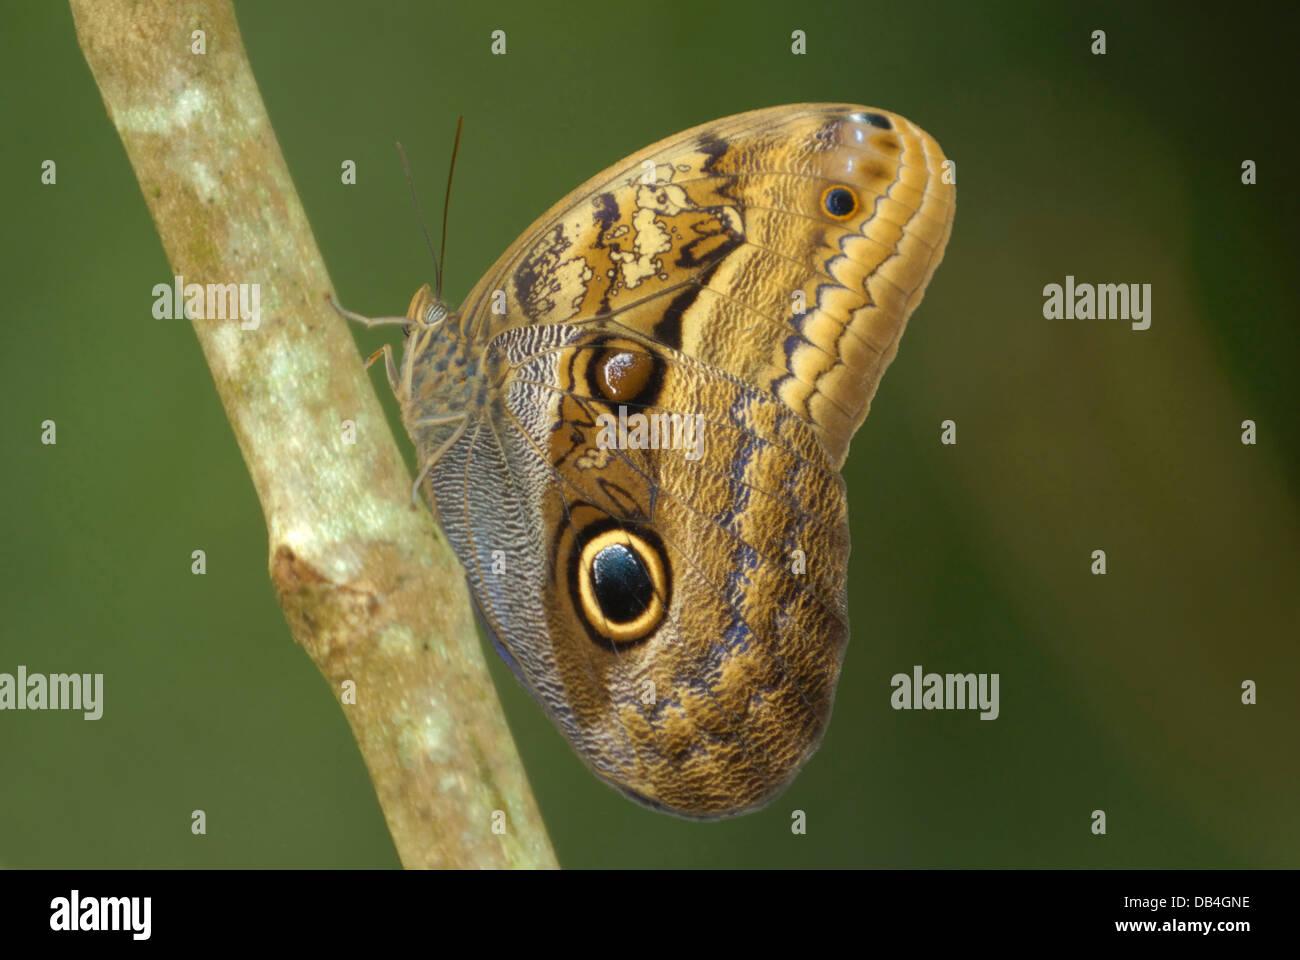 Areneros gigante mariposa búho (Caligo illionius rainforest) en Costa Rica. Imagen De Stock